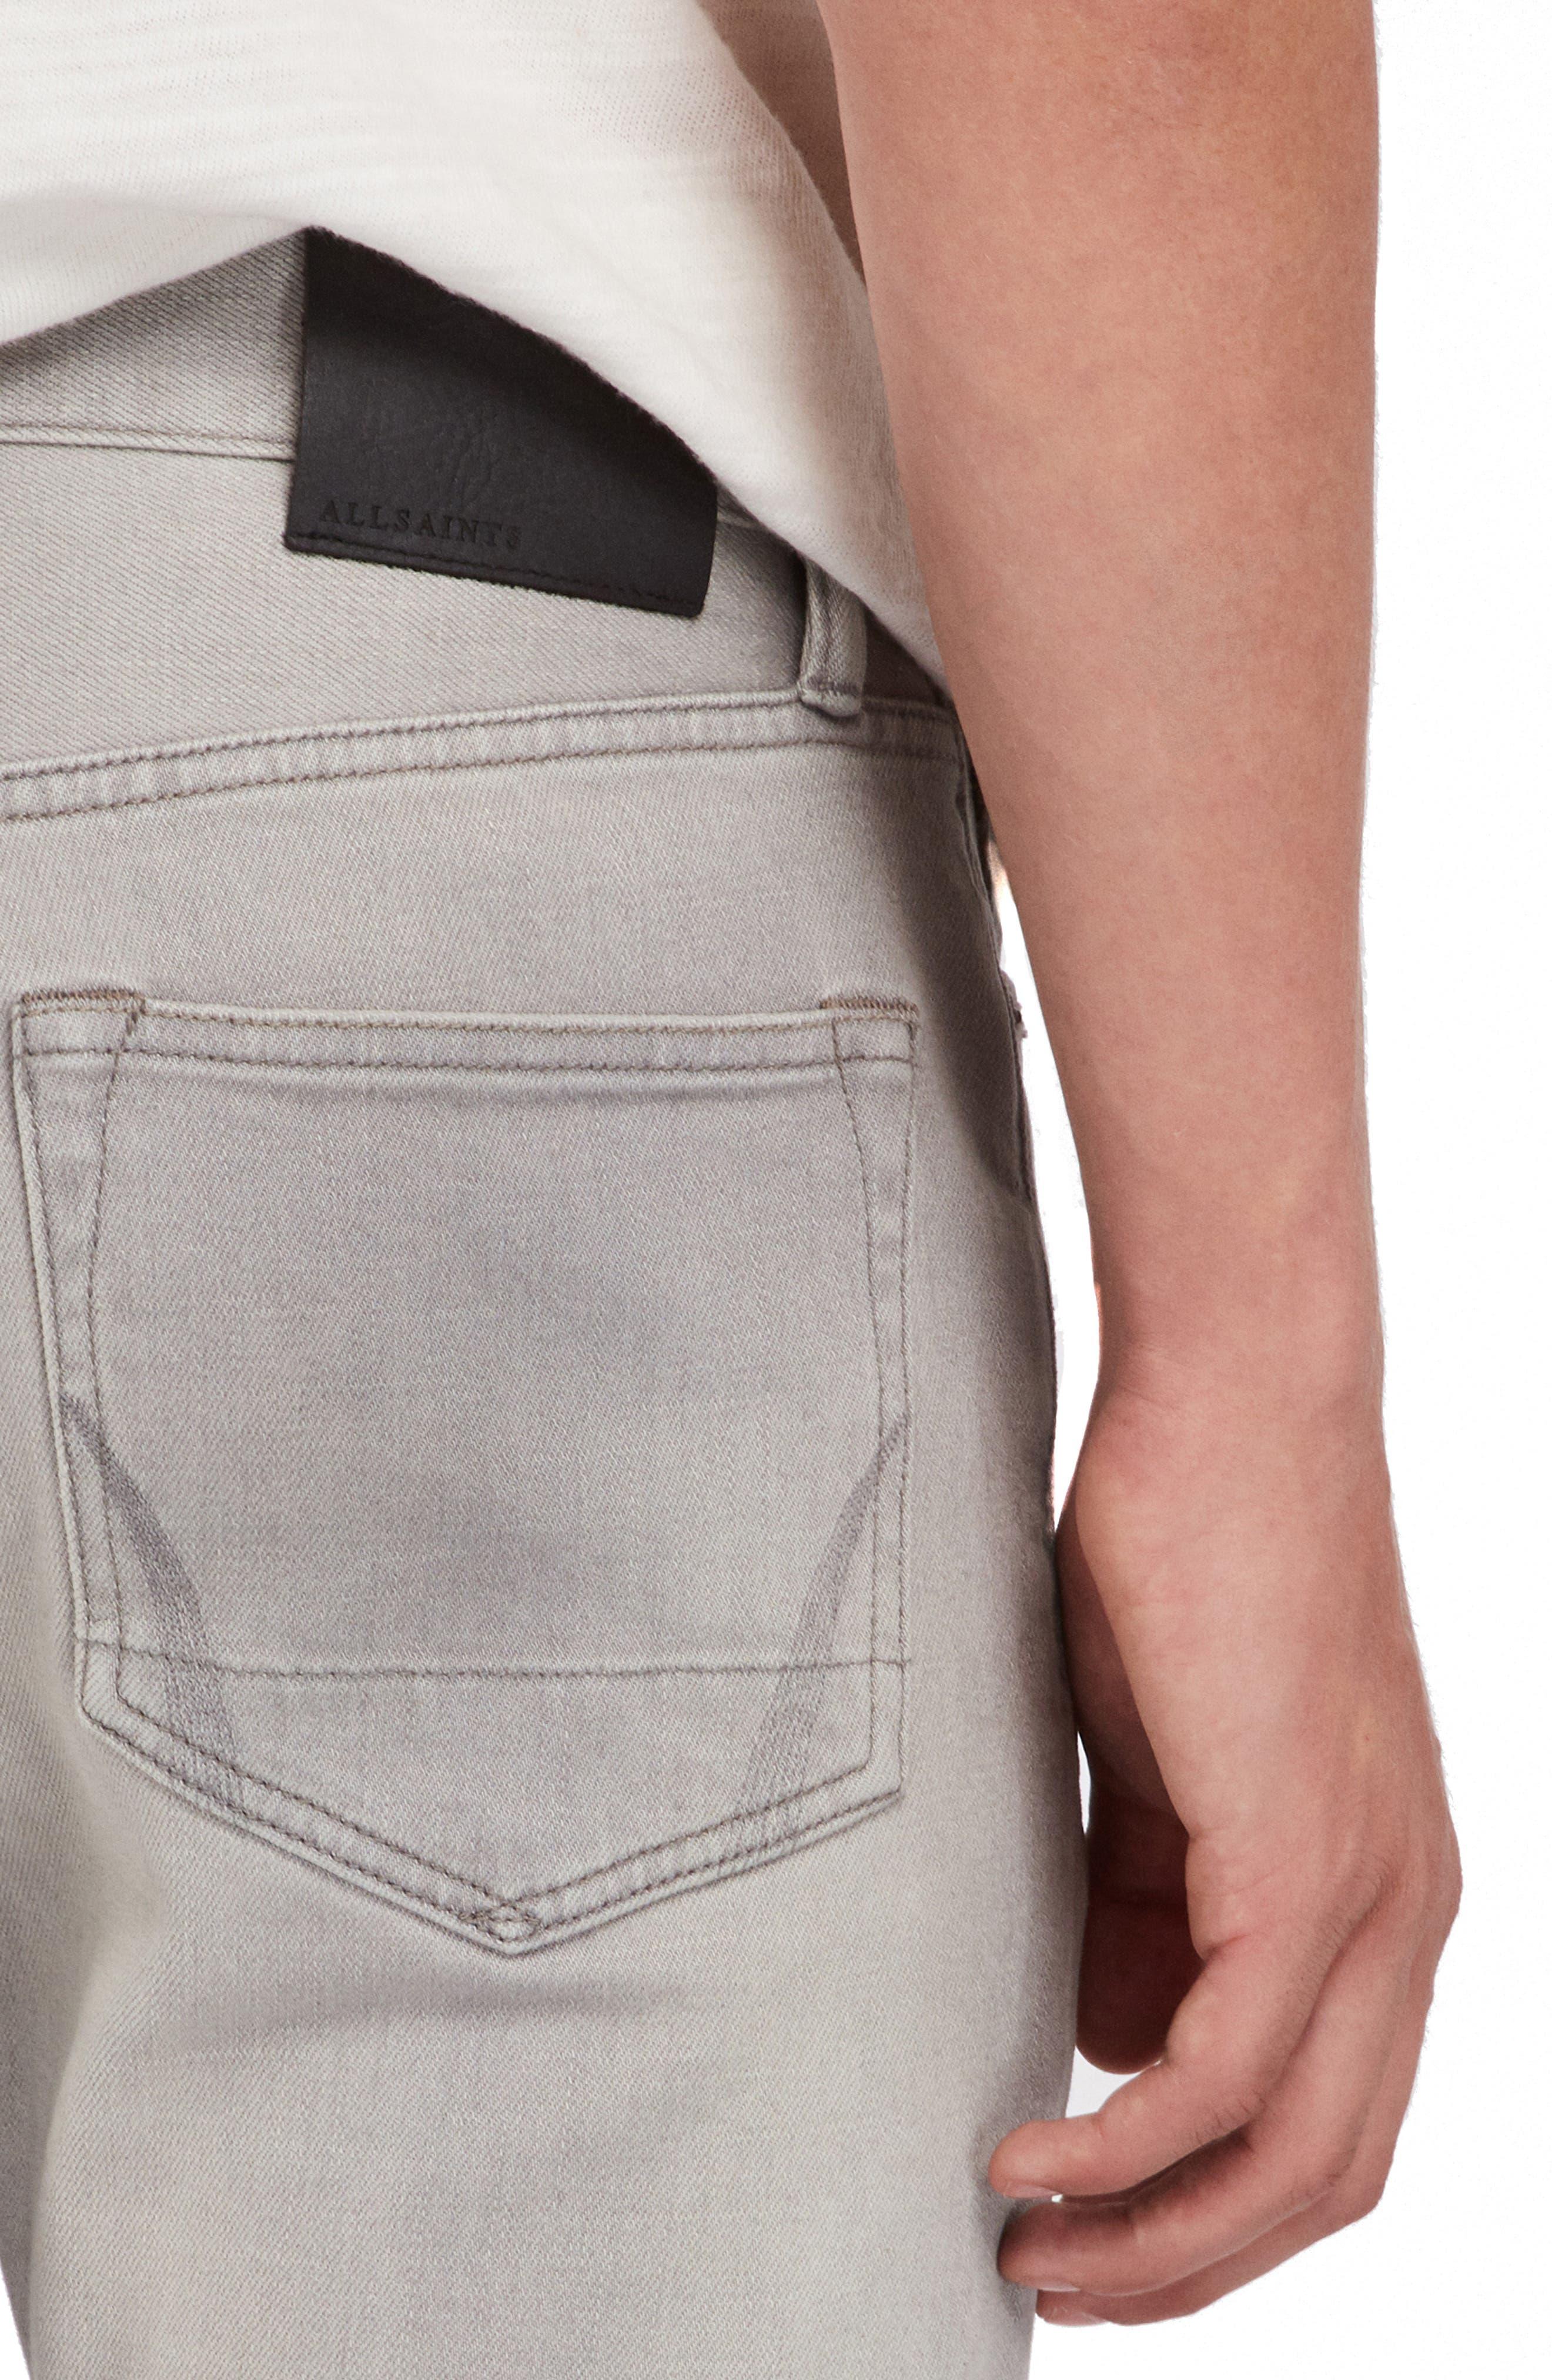 ALLSAINTS, Raveline Cigarette Skinny Fit Jeans, Alternate thumbnail 5, color, GREY